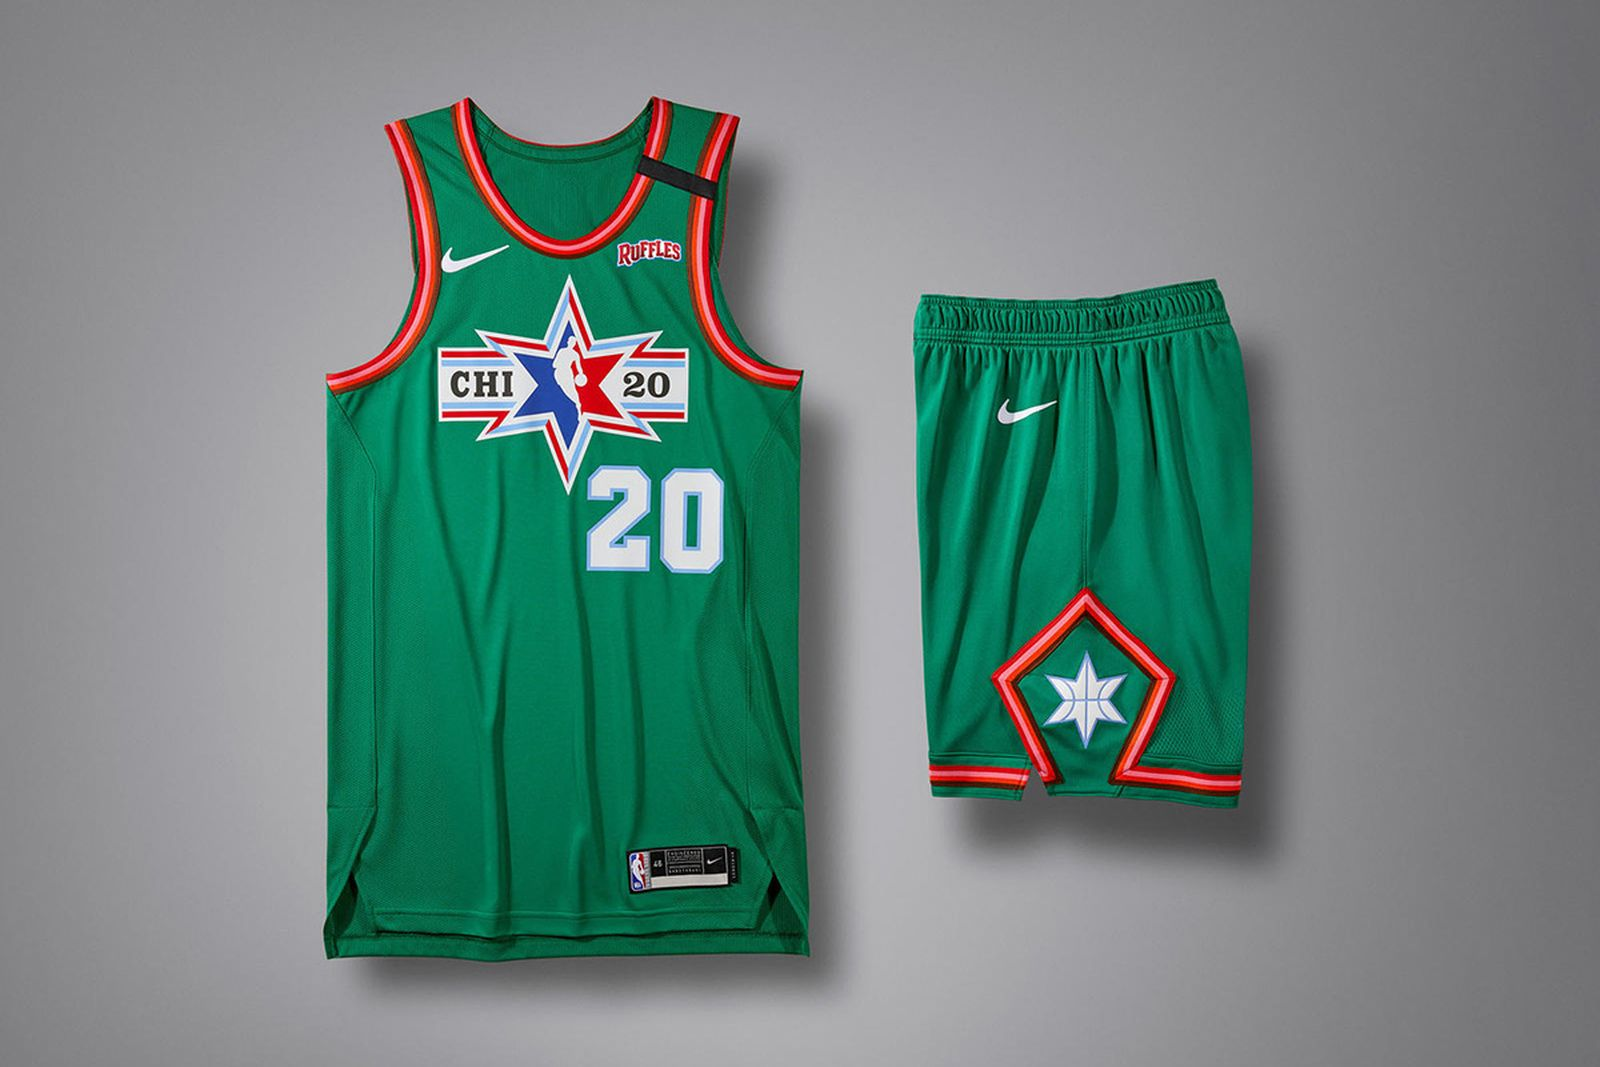 jordan-brand-nba-star-game-uniforms-05